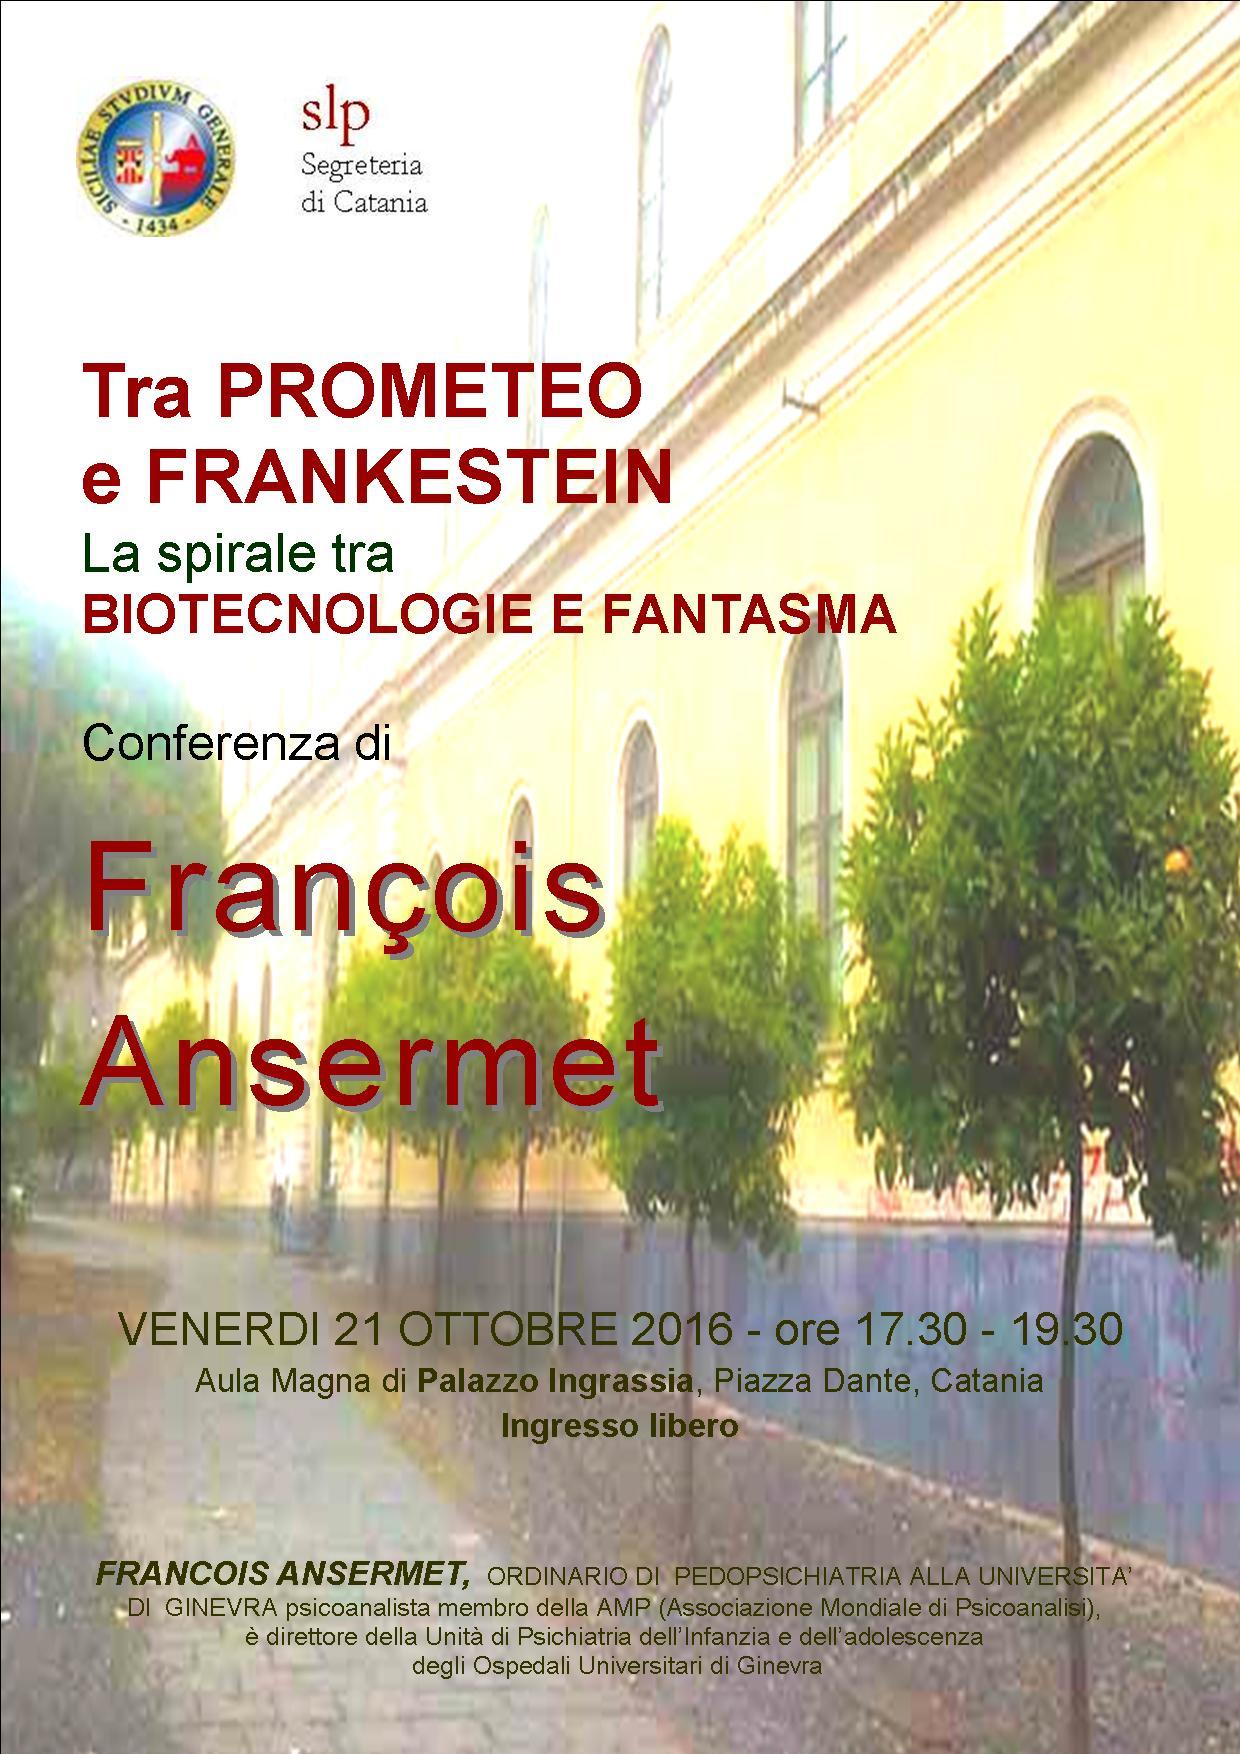 La spirale tra biotecnologie e fantasma: tra Prometeo e Frankestein